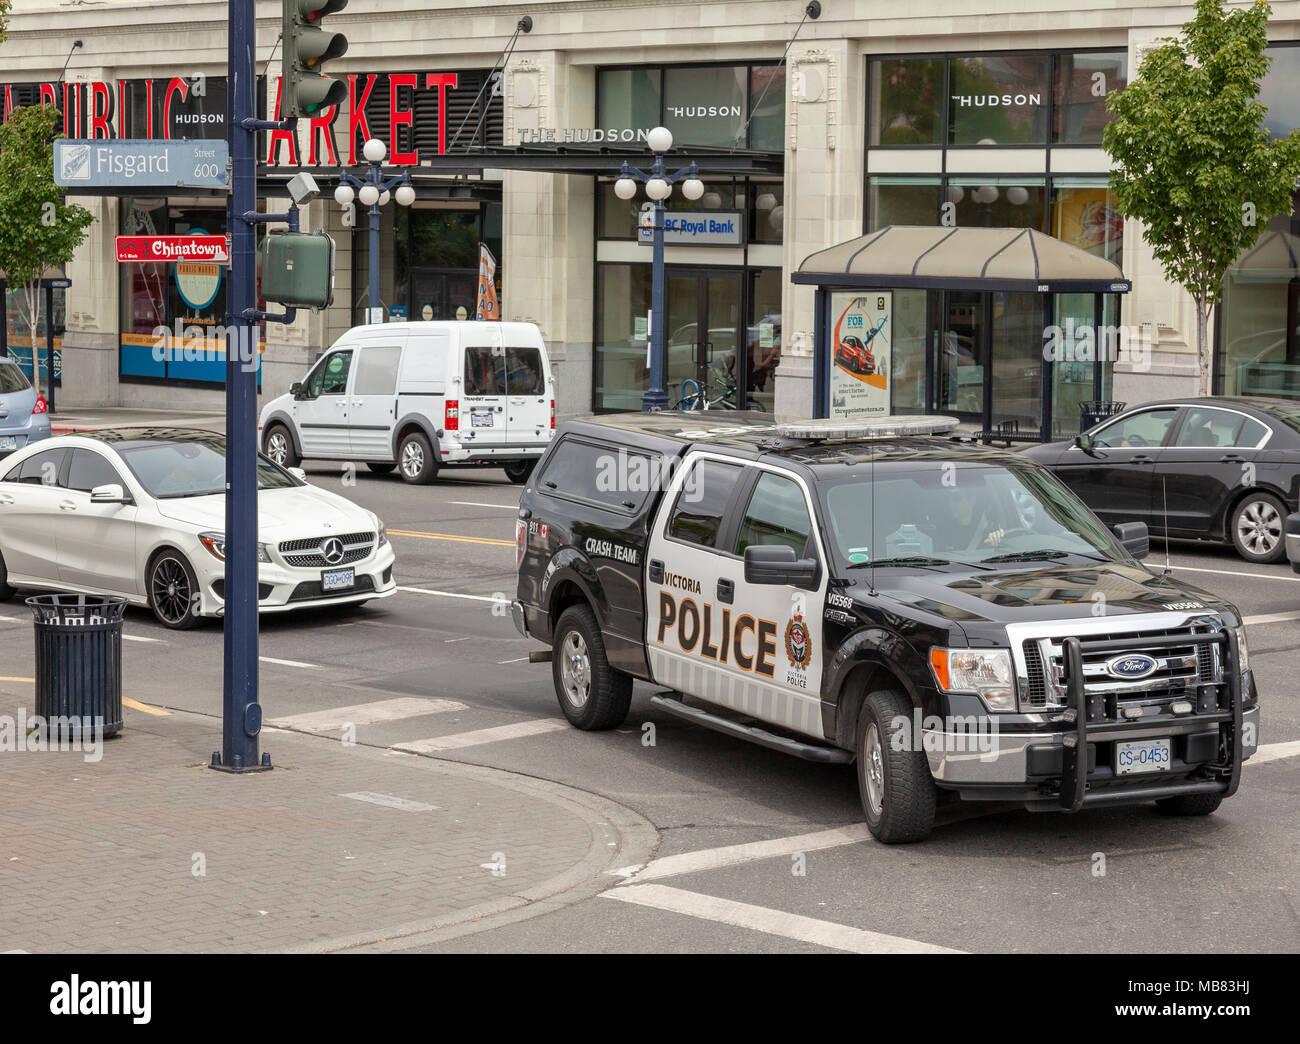 Police Patrol car, Victoria, British Columbia, Canada - Stock Image